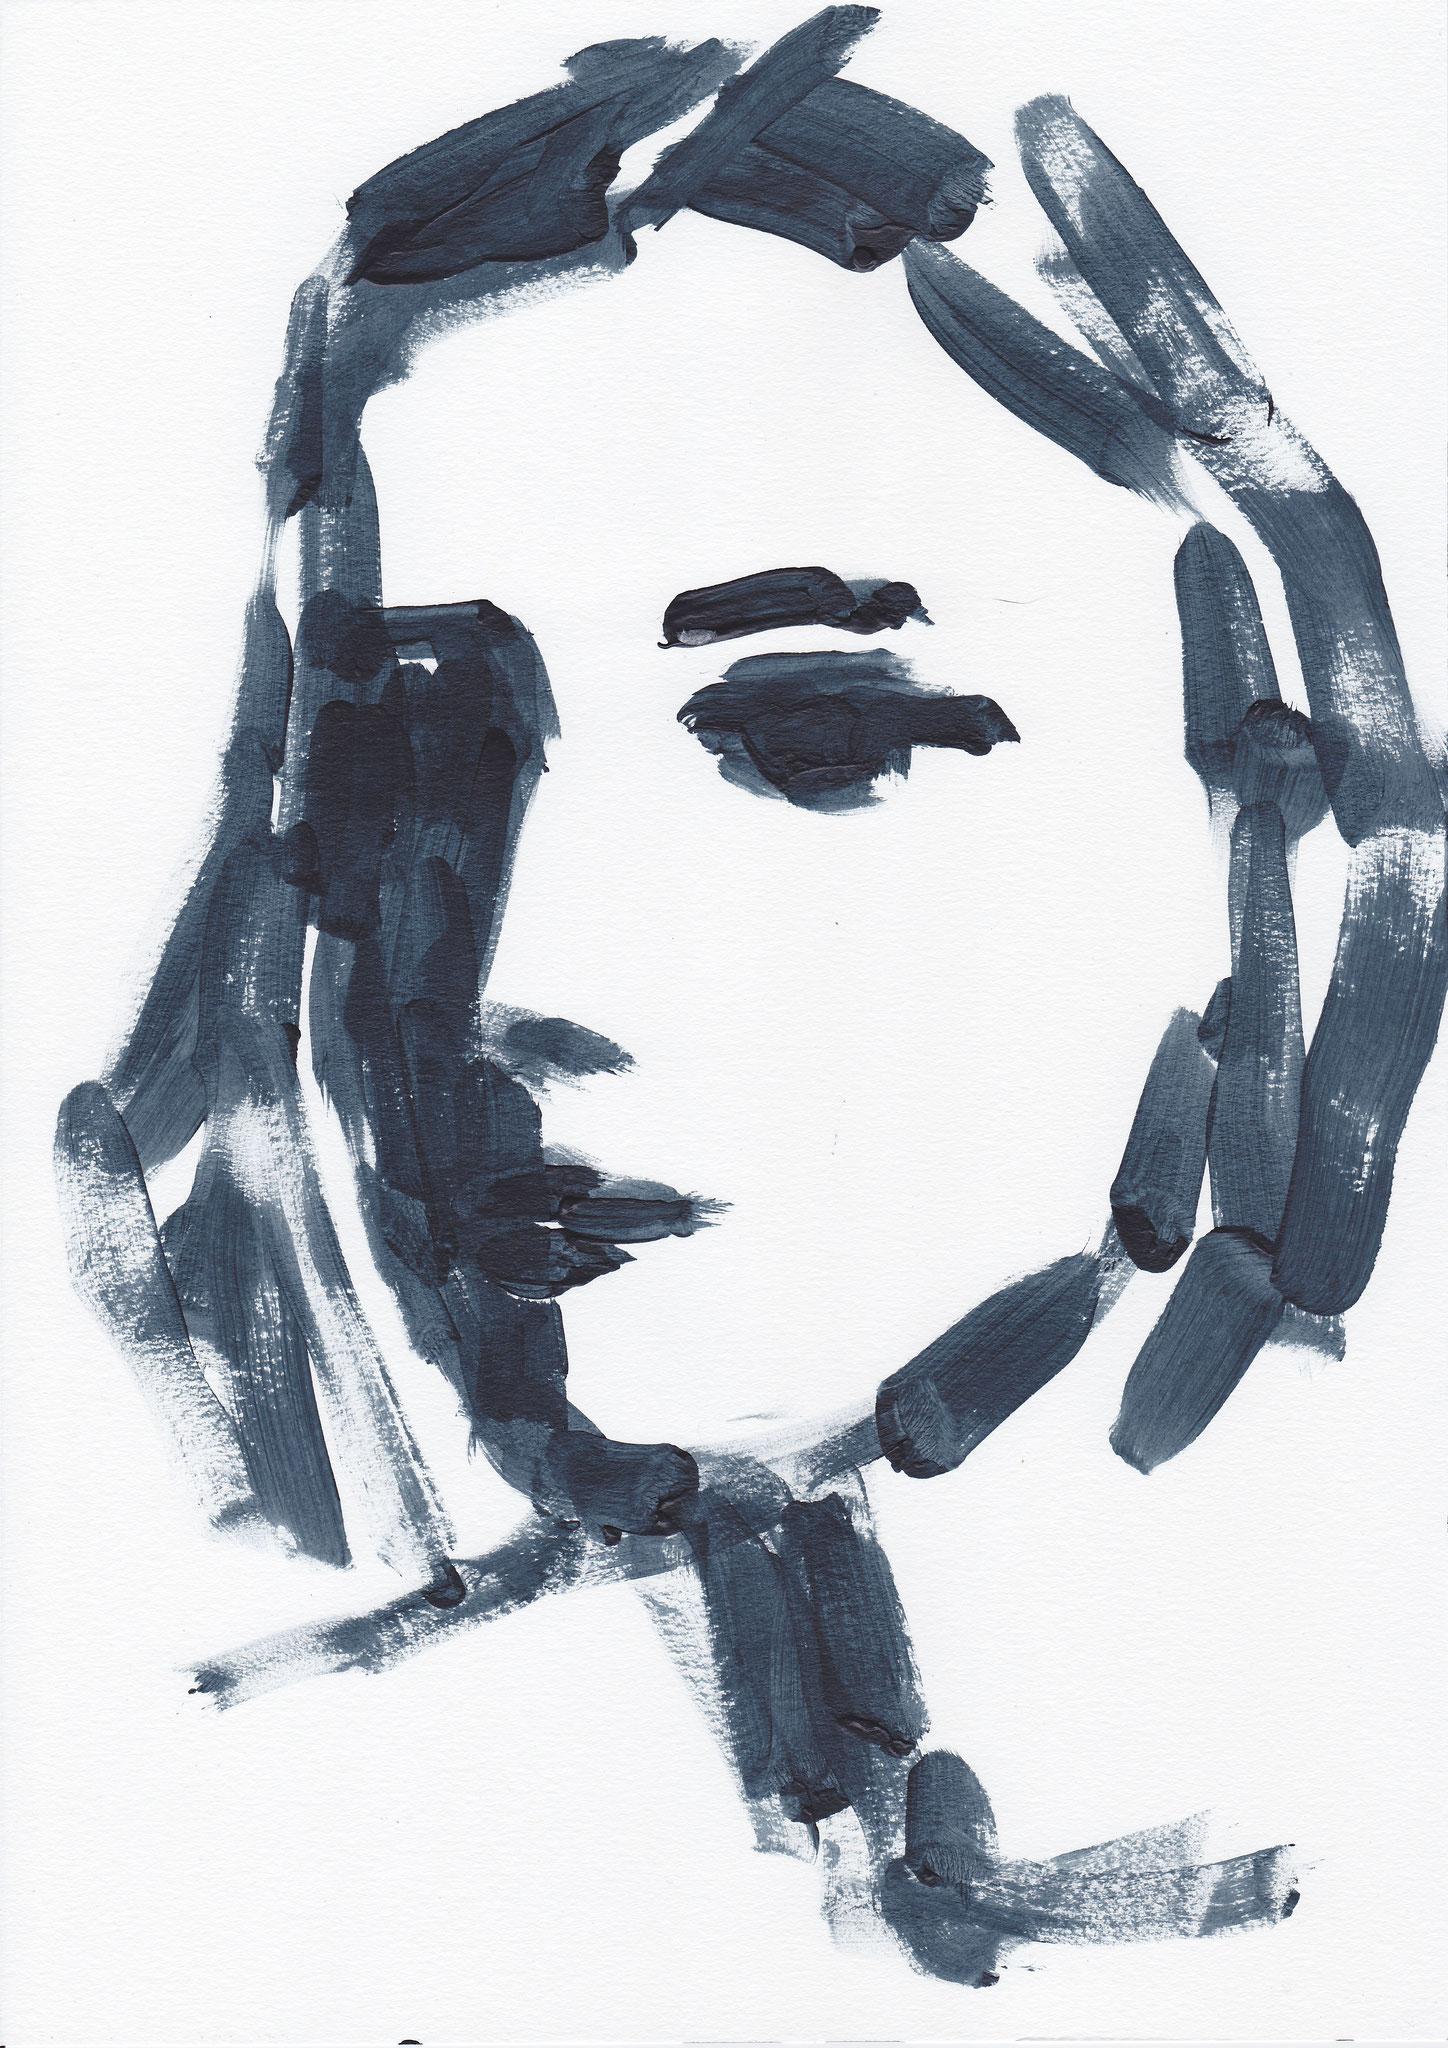 026 , acrylic on paper , 29.7 x 21cm , Selina Saranova